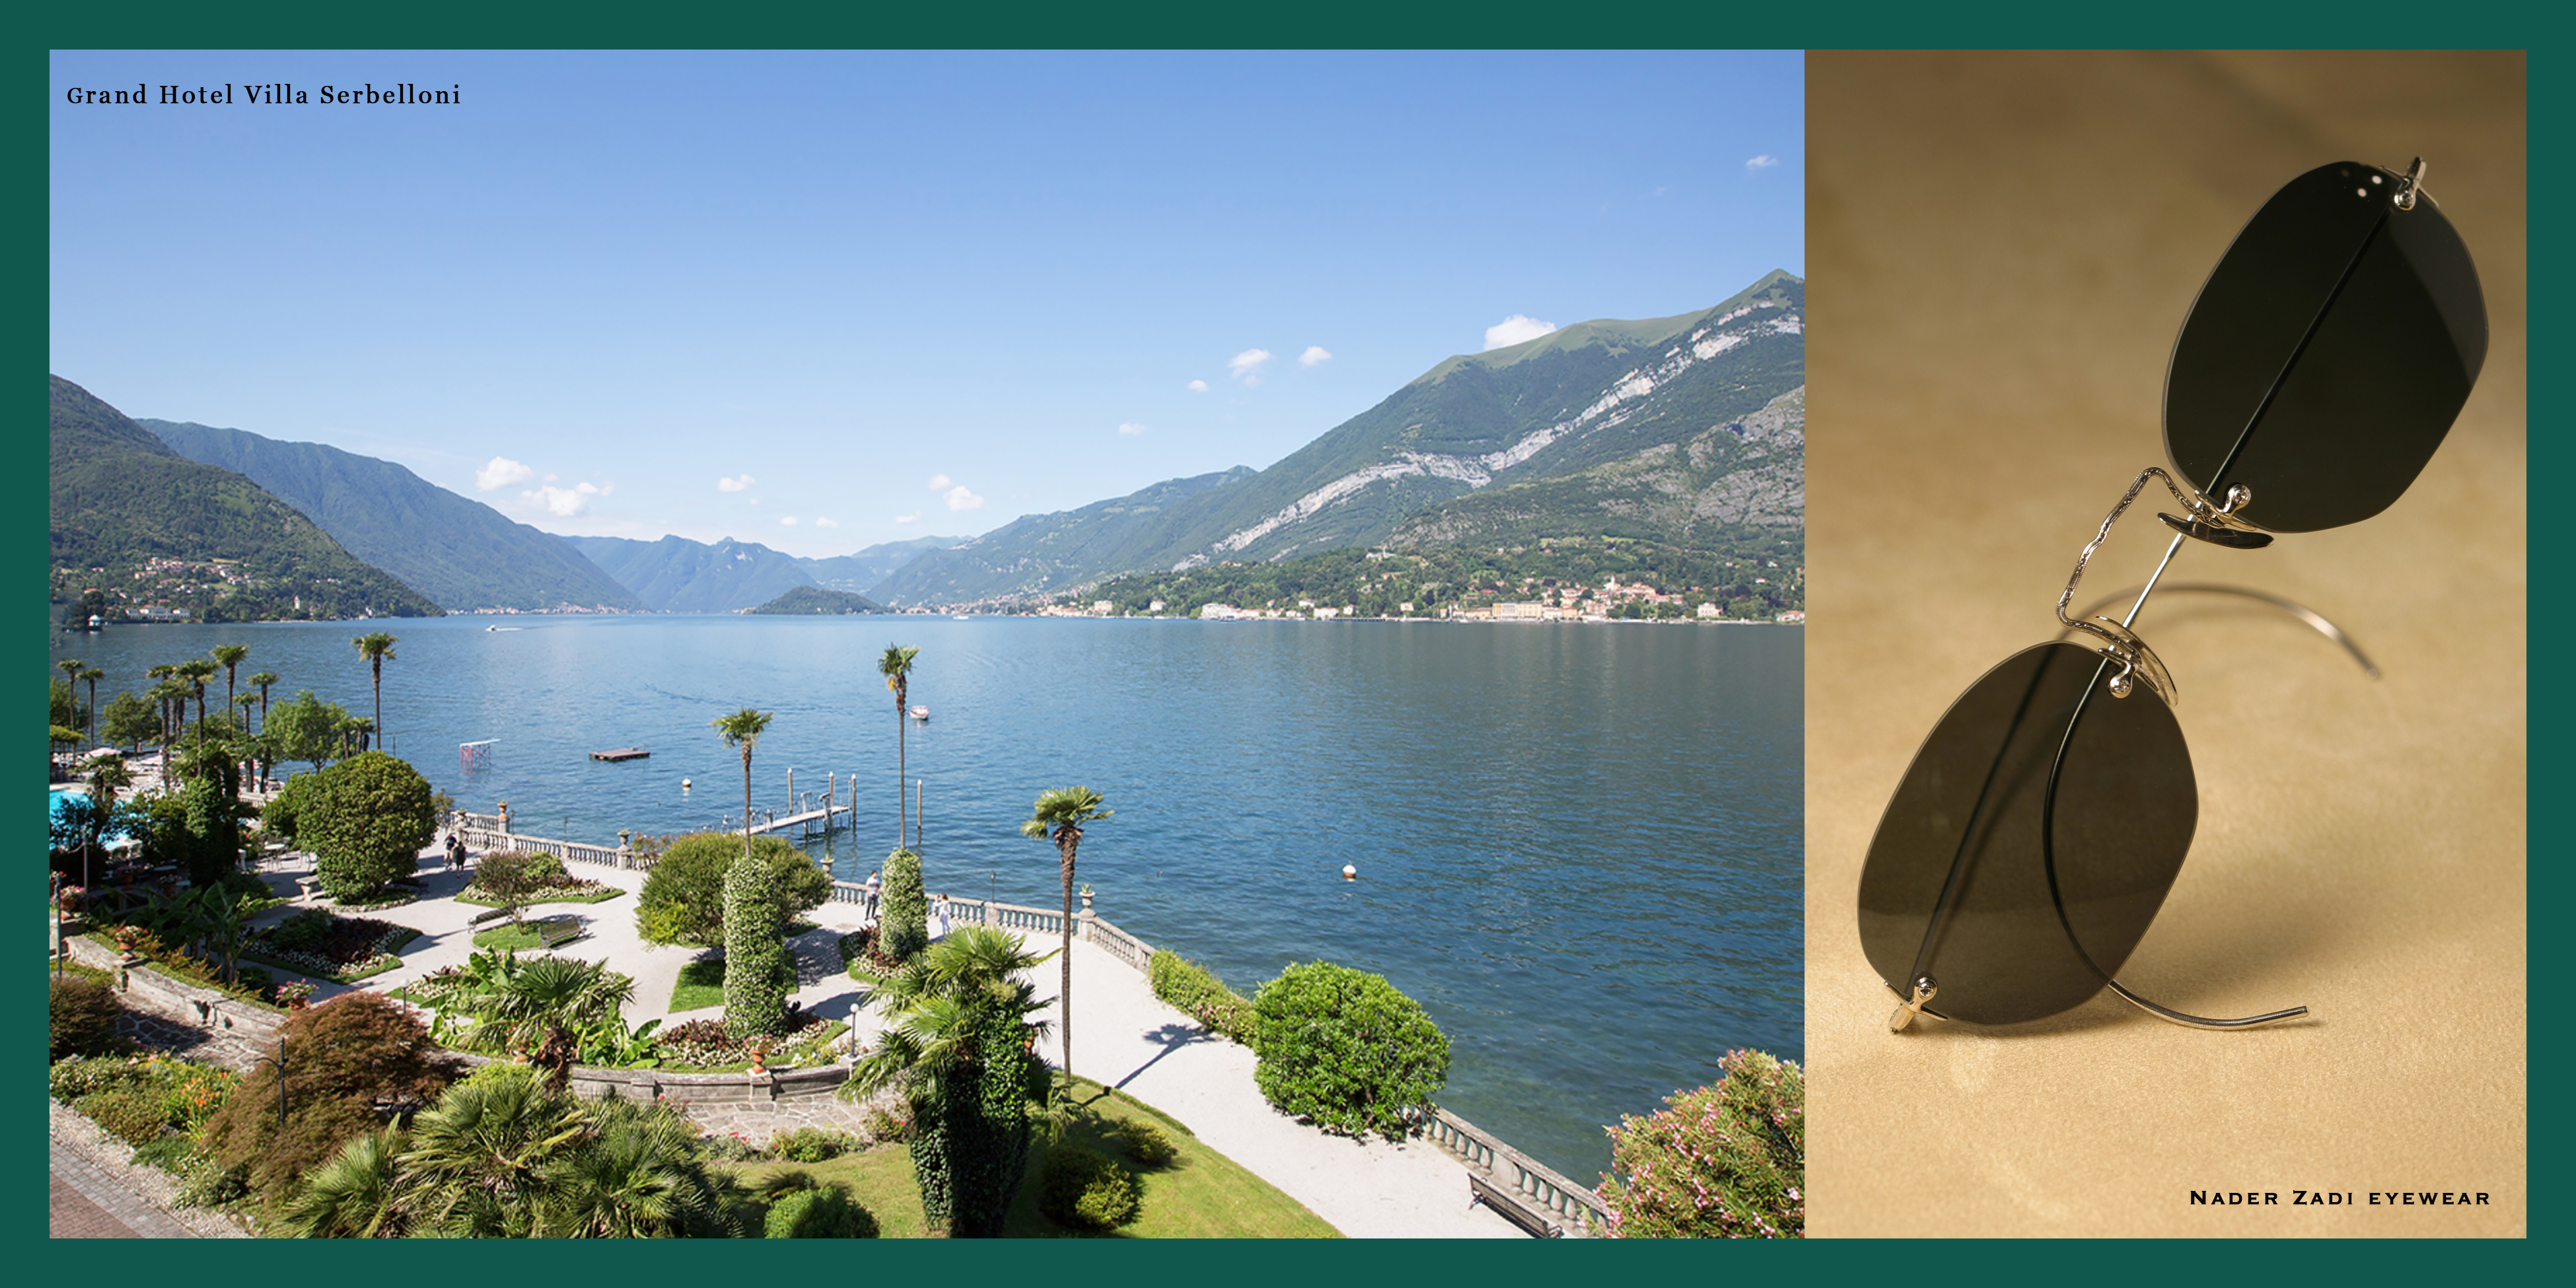 Post 9 - Destination Bellagio, lake como, Italy